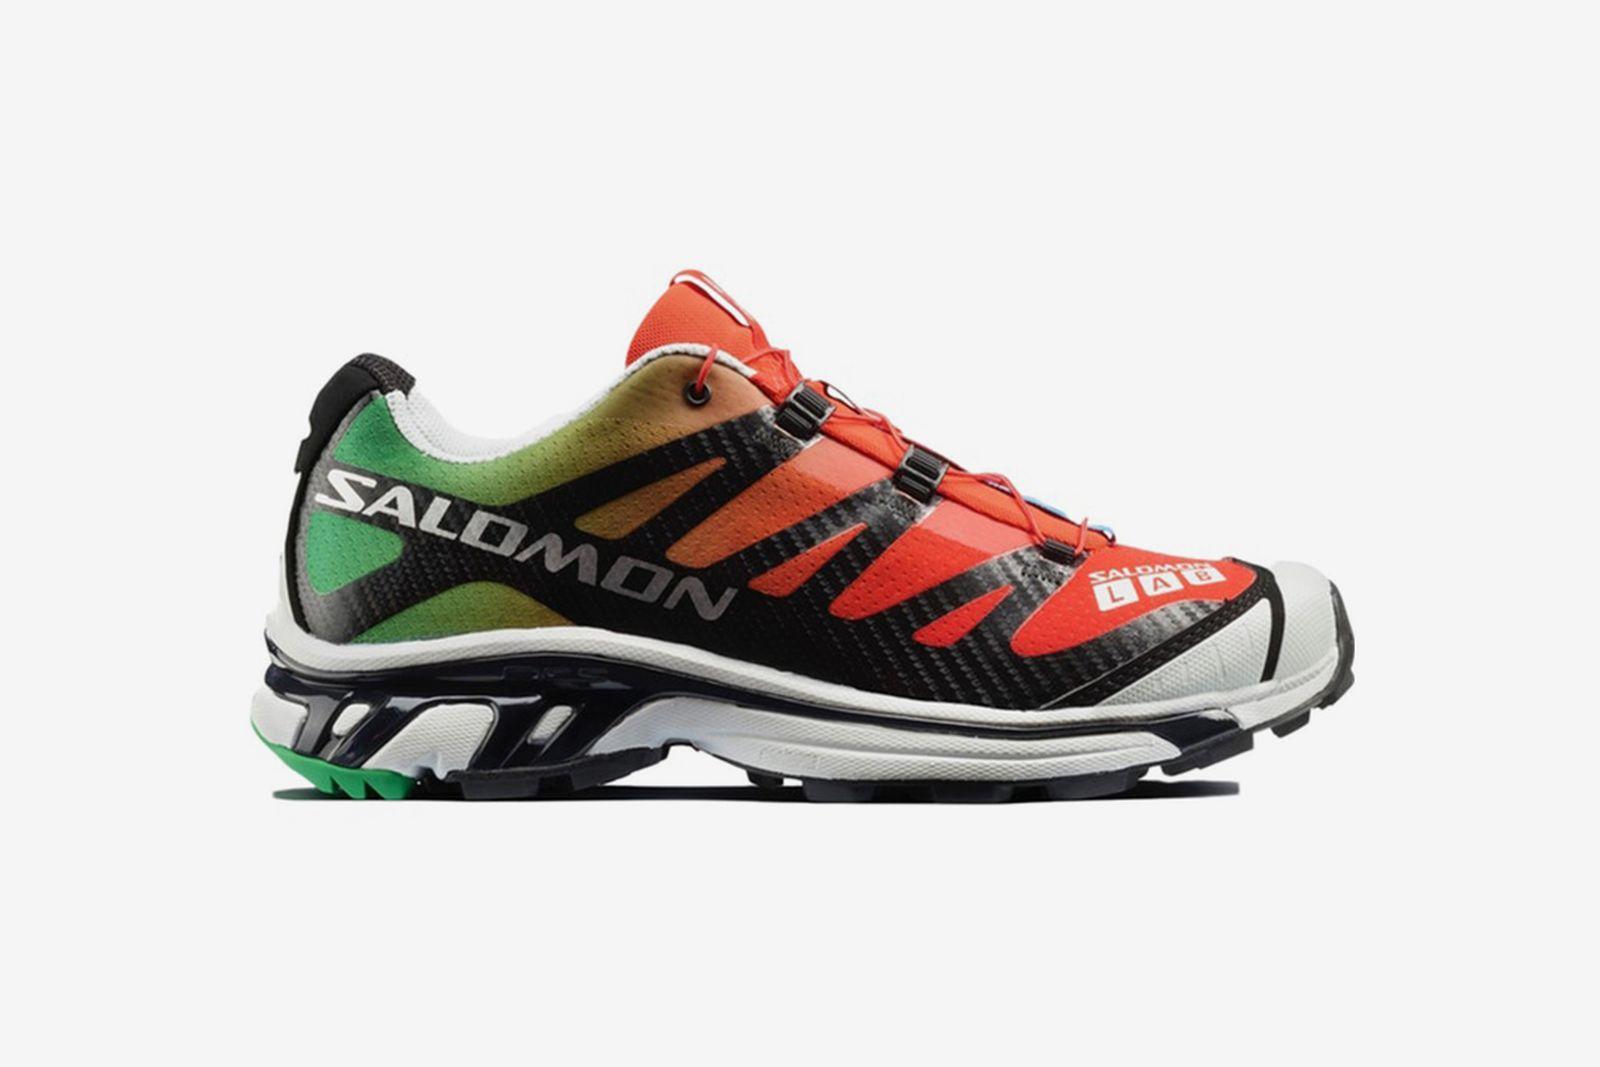 salomon-best-sneakers-01